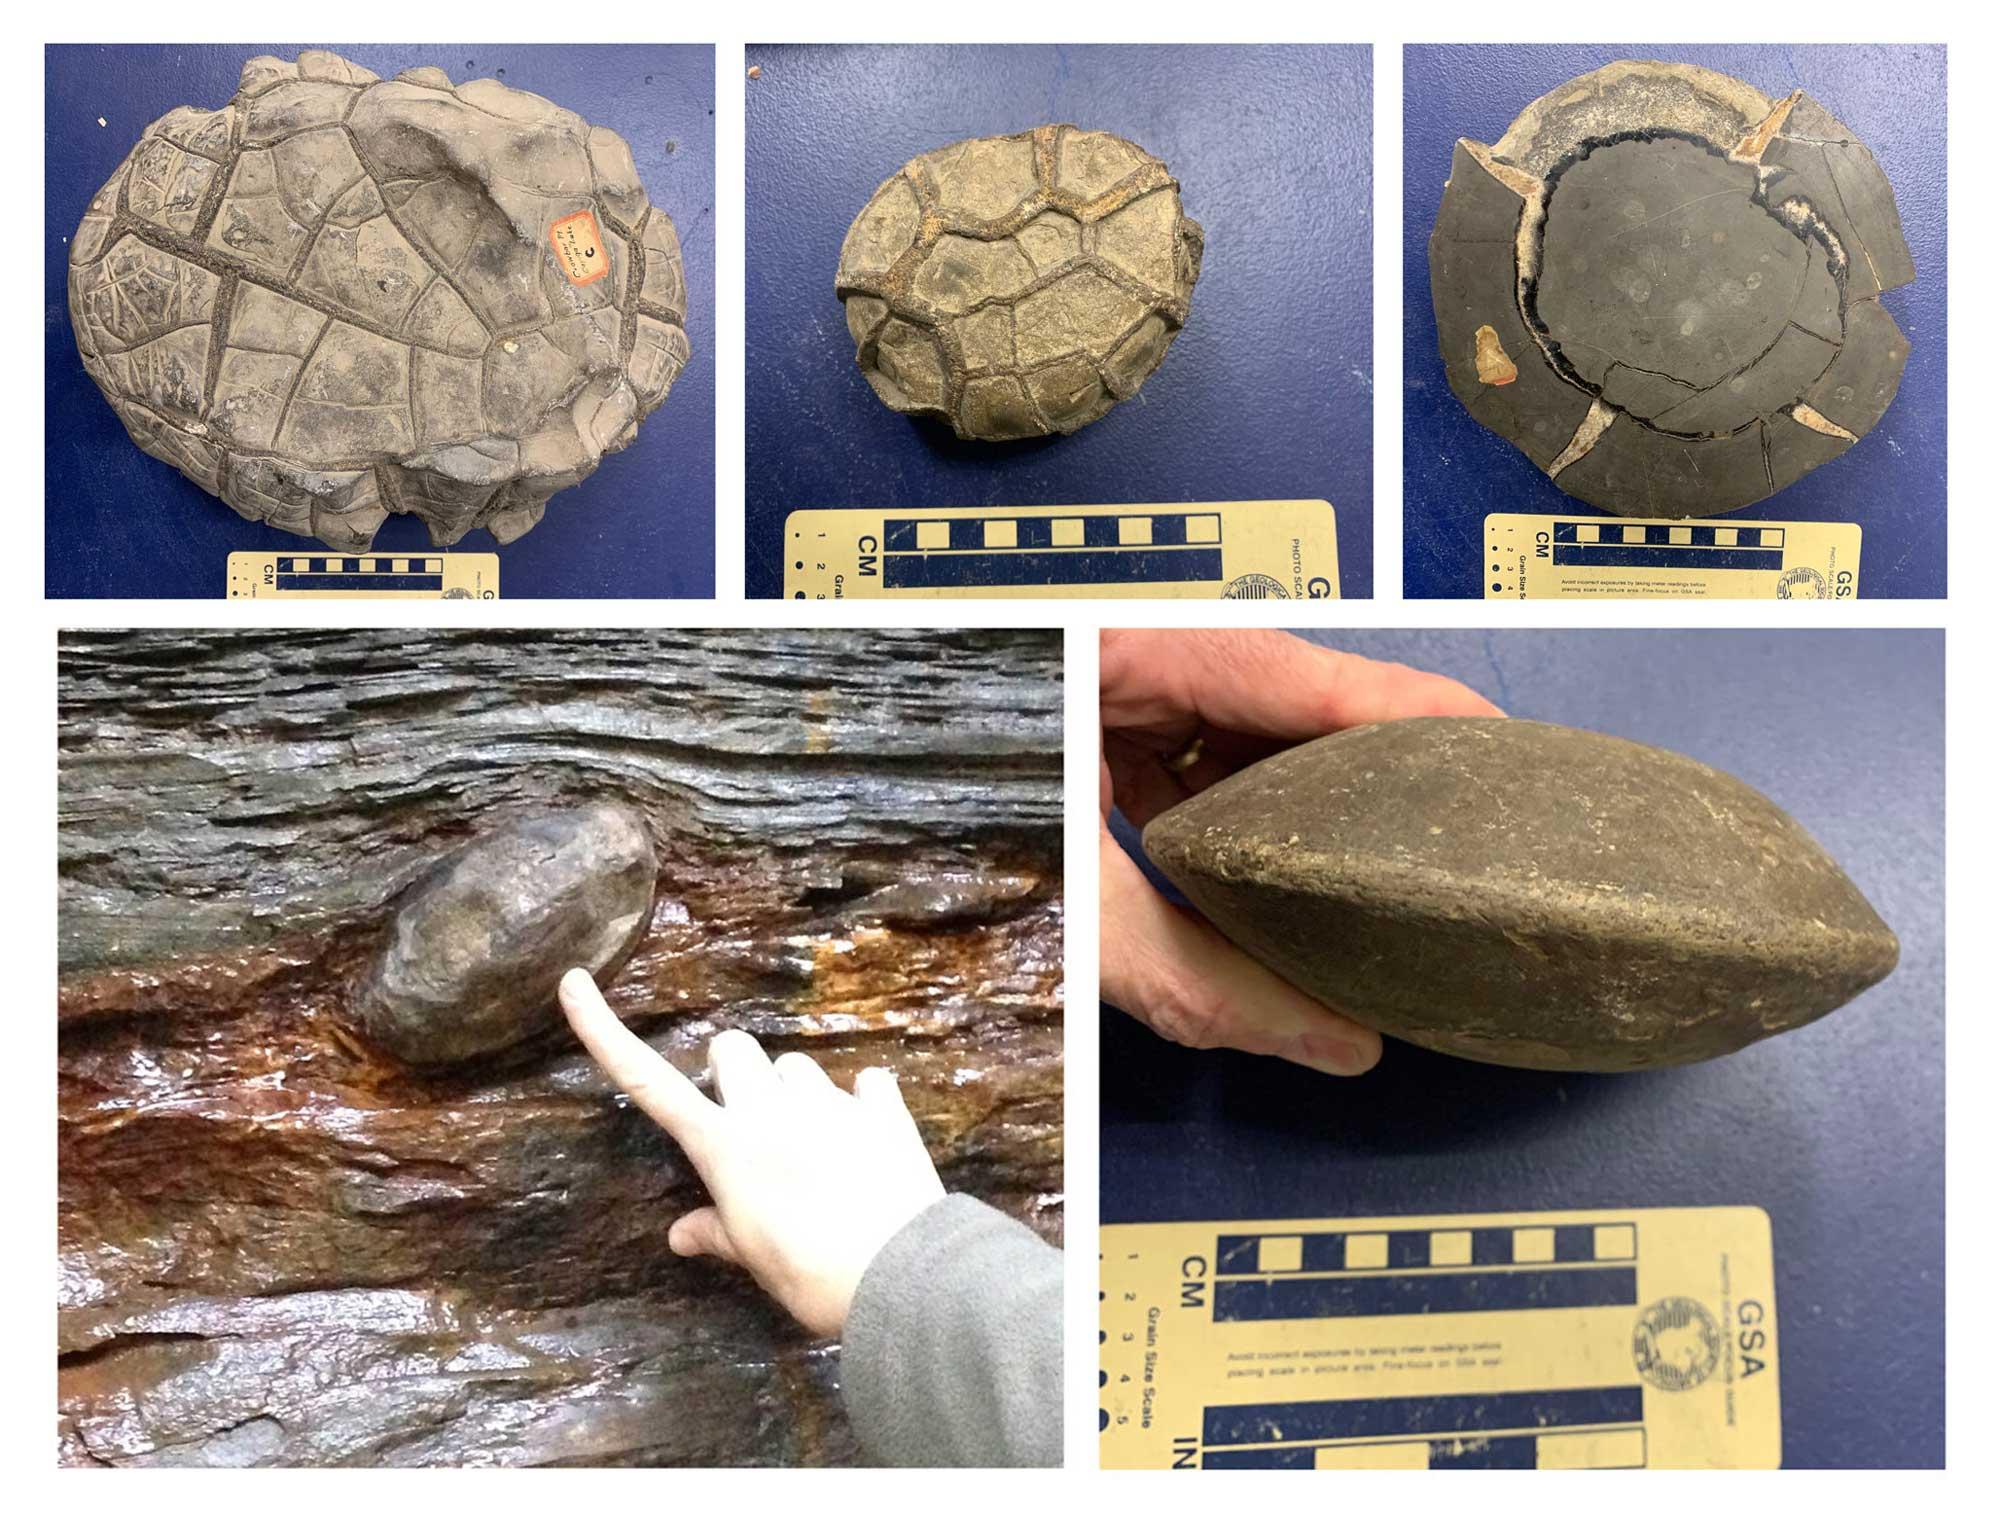 Five photographs of concretion specimens.